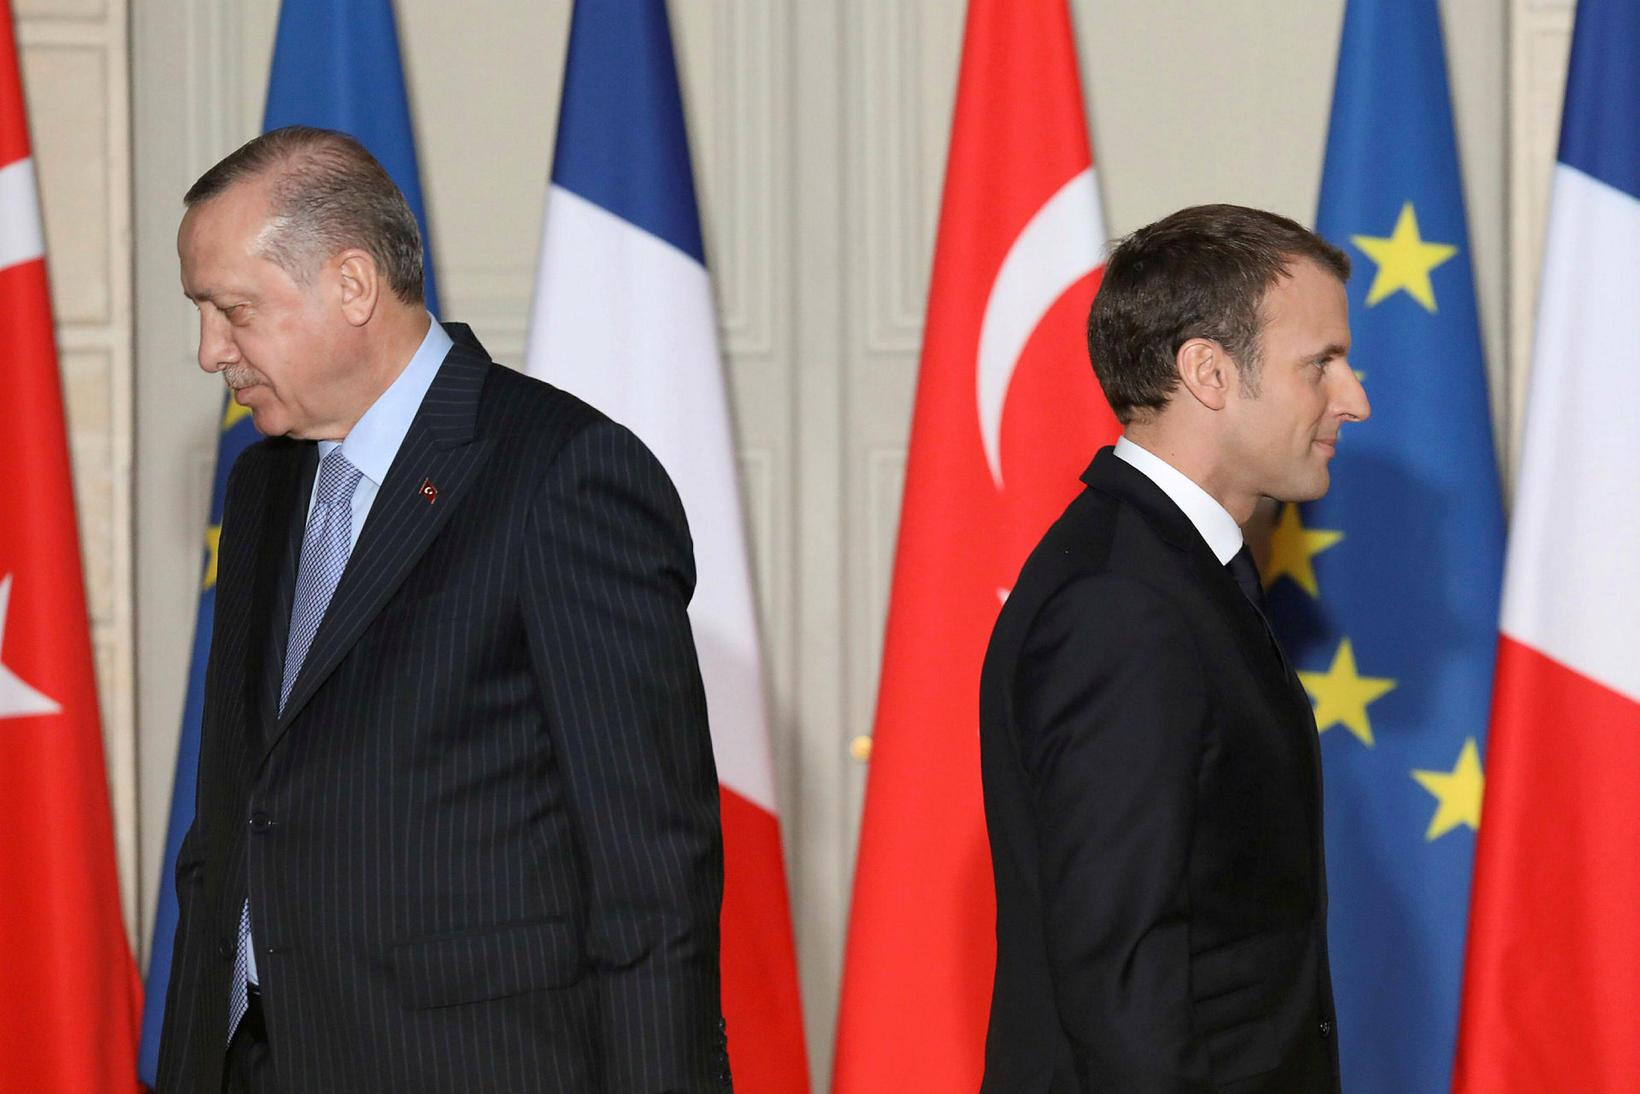 Recep Tayyip Erdogan Tyrklandsforseti og Emmanuel Macron Frakklandsforseti snúa baki …